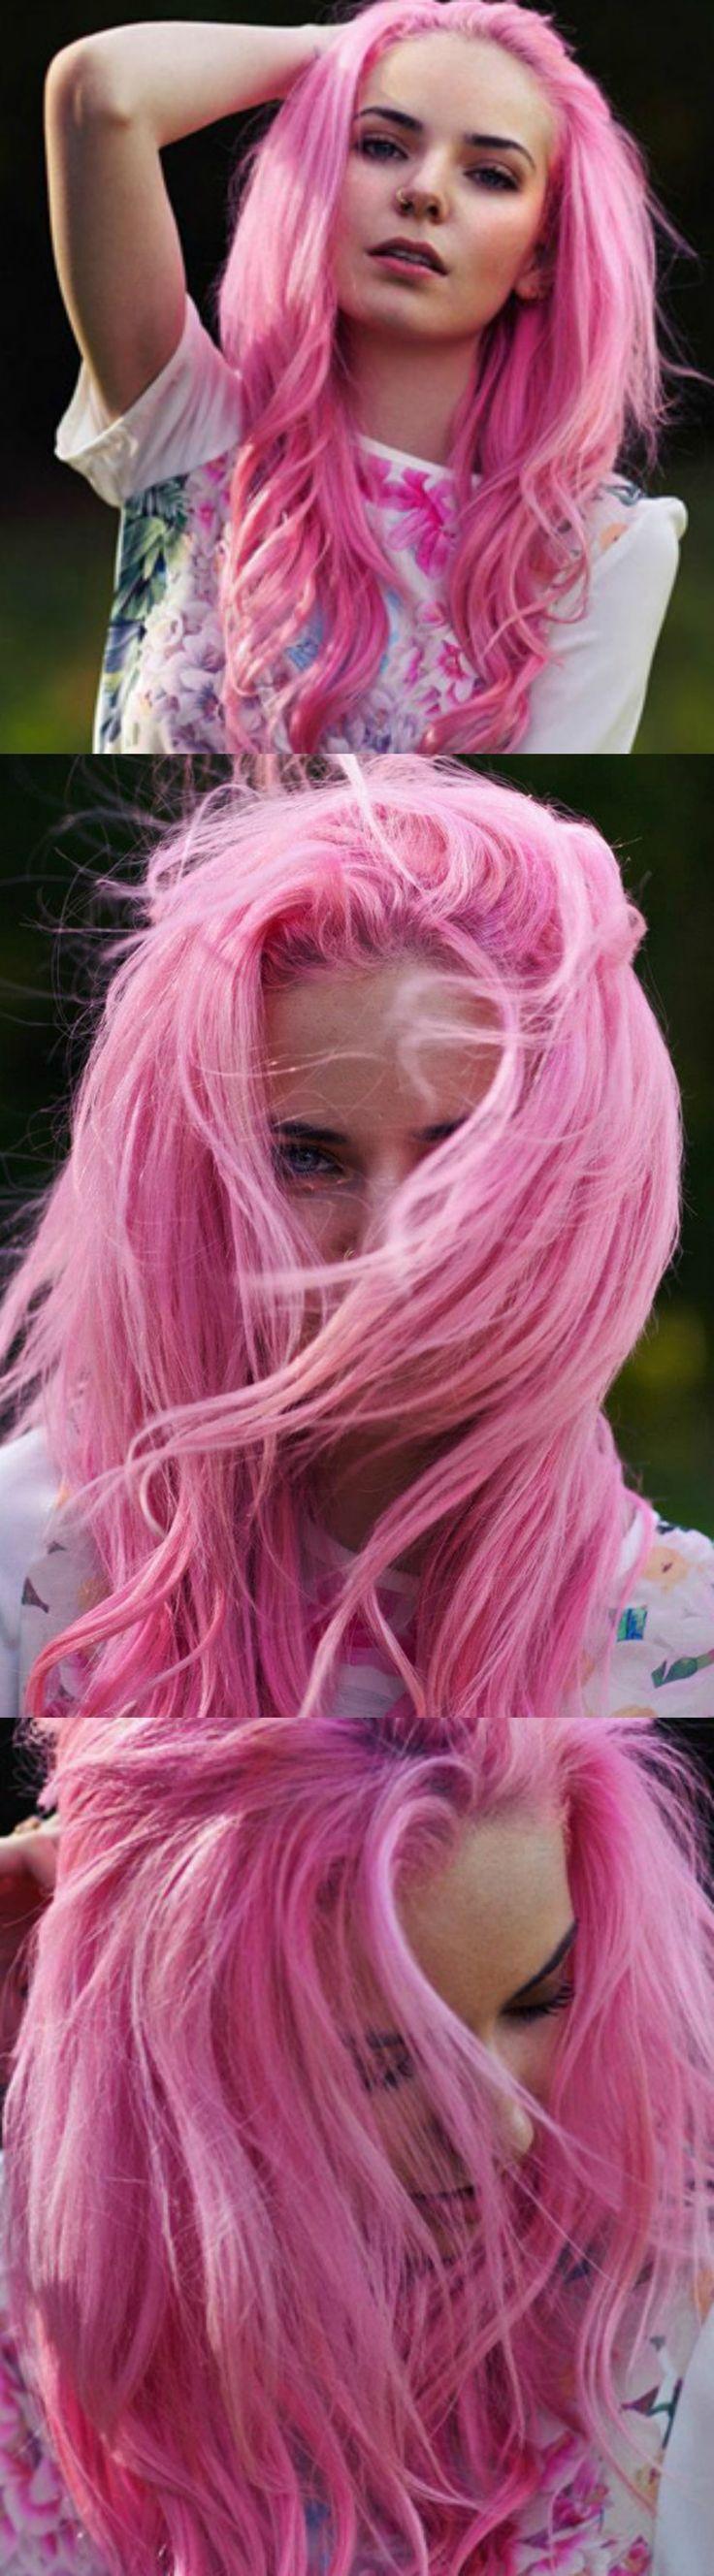 Best 25+ Hair tips dyed ideas on Pinterest | Pastel hair ...